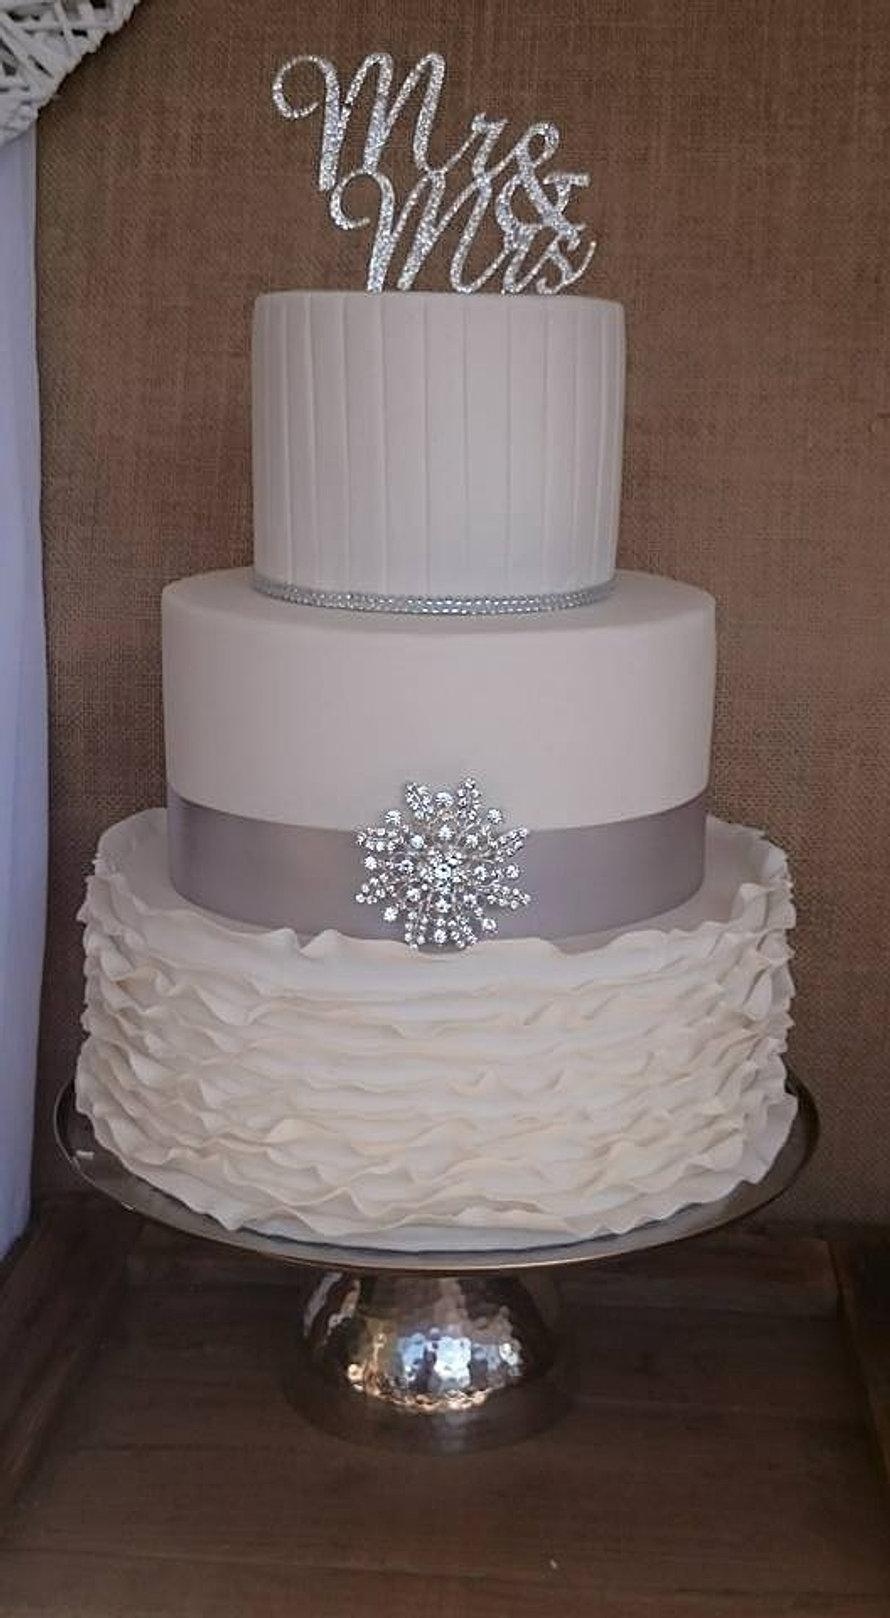 Dog Ate Wedding Cake